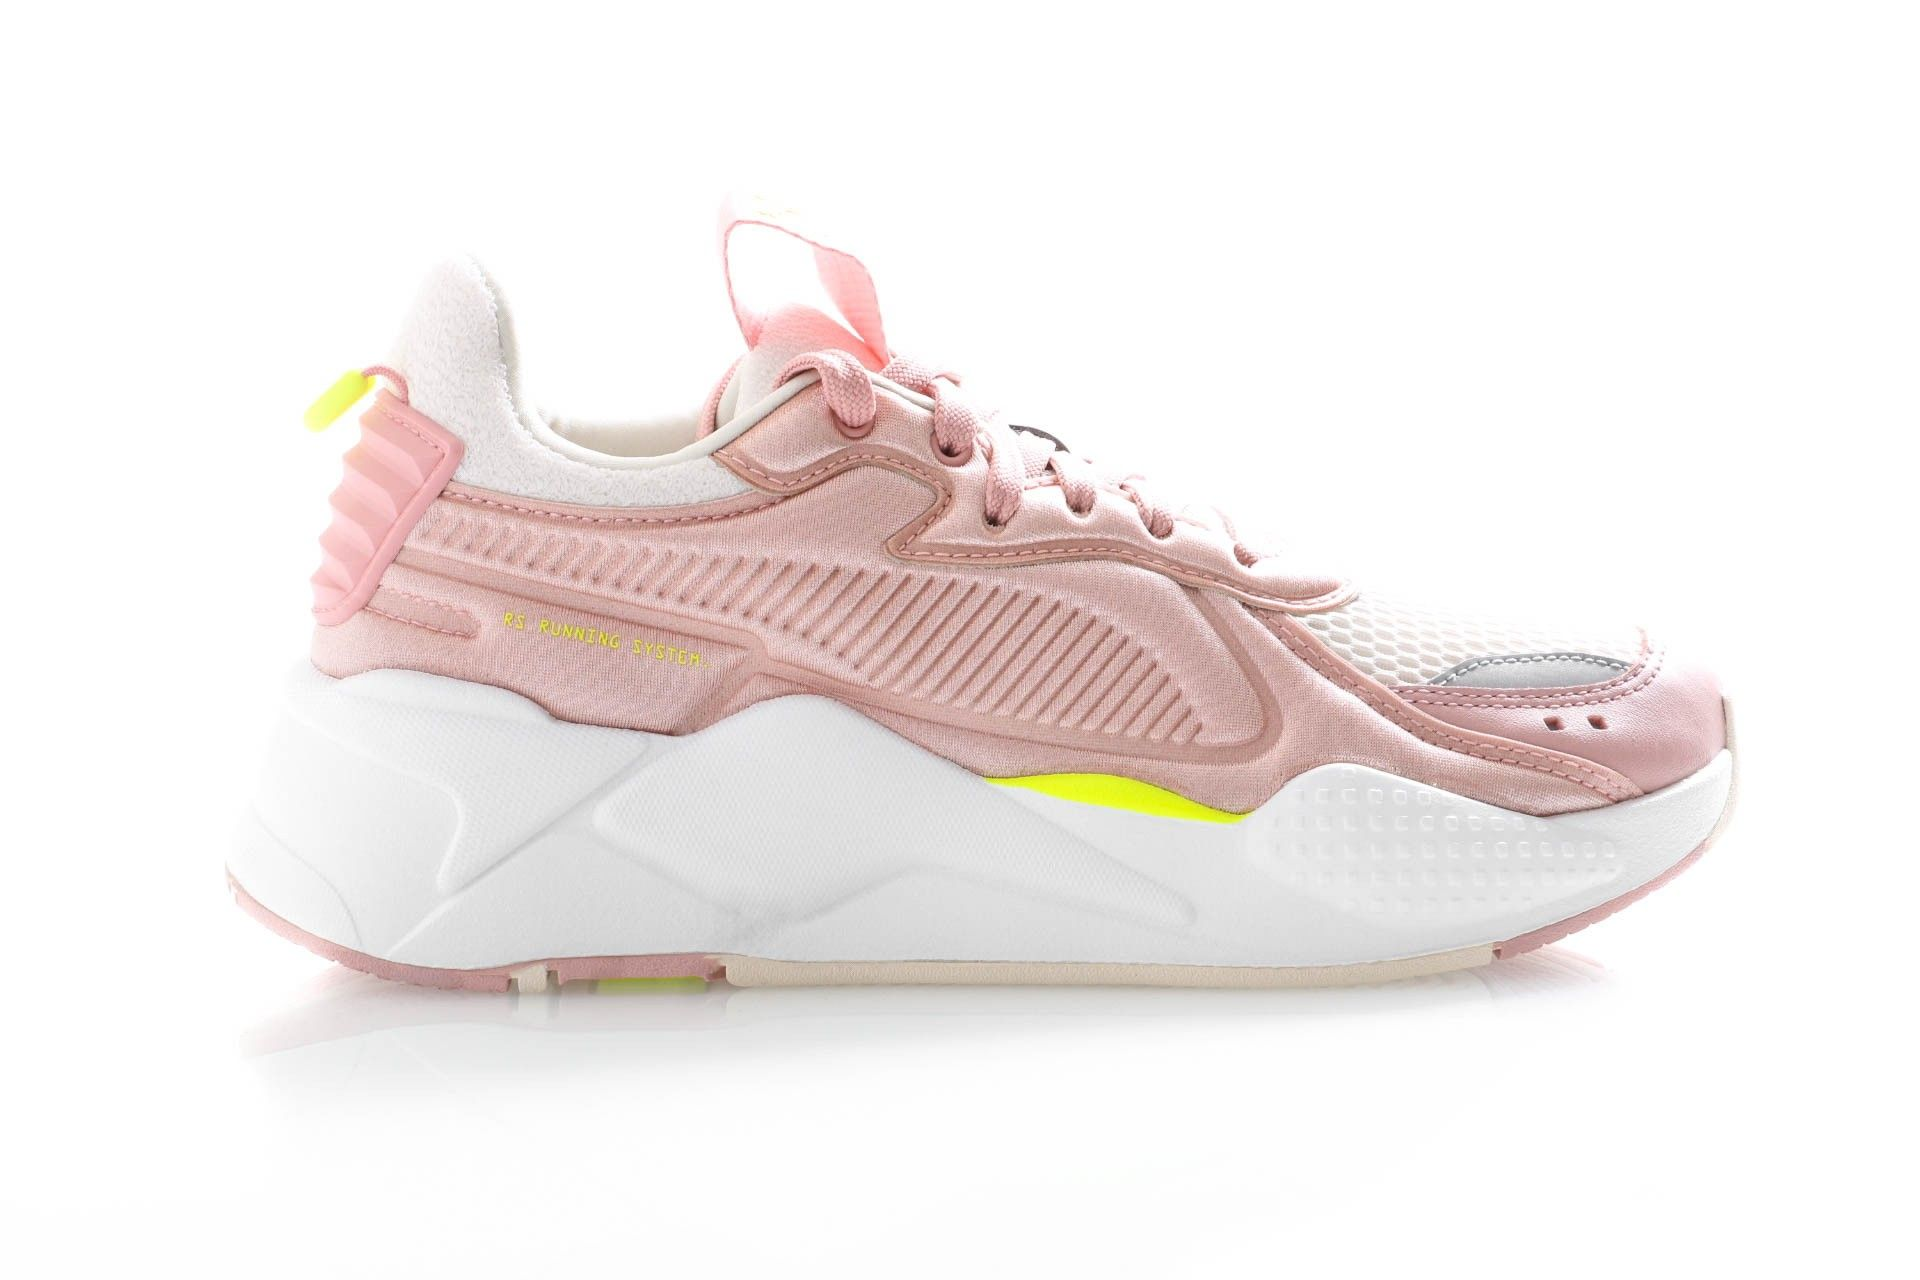 Afbeelding van Puma Sneakers RS-X Soft Case bridal rose-pastel parchment 369819 07